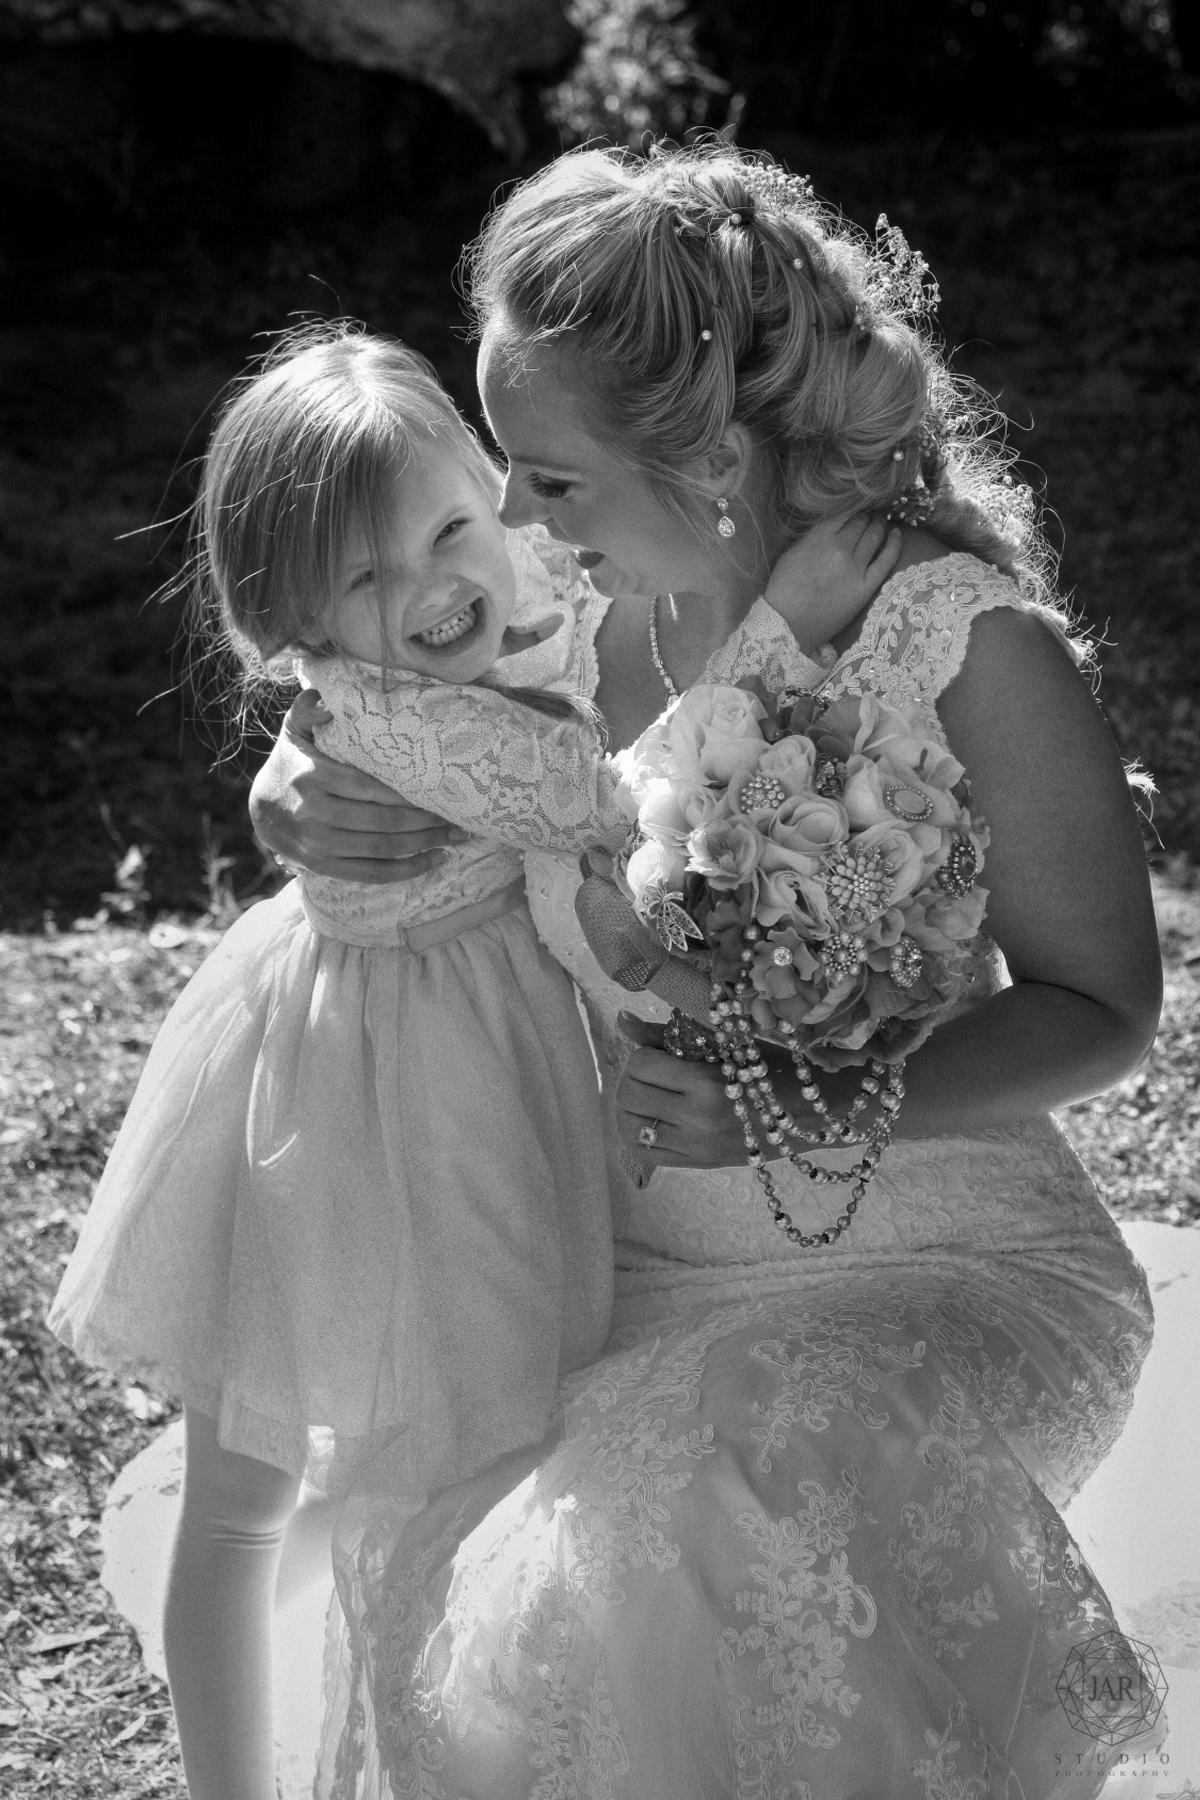 21-bride-rapunzel-hair-bouquet-flower-girl-cute-wedding-jarstudio.JPG